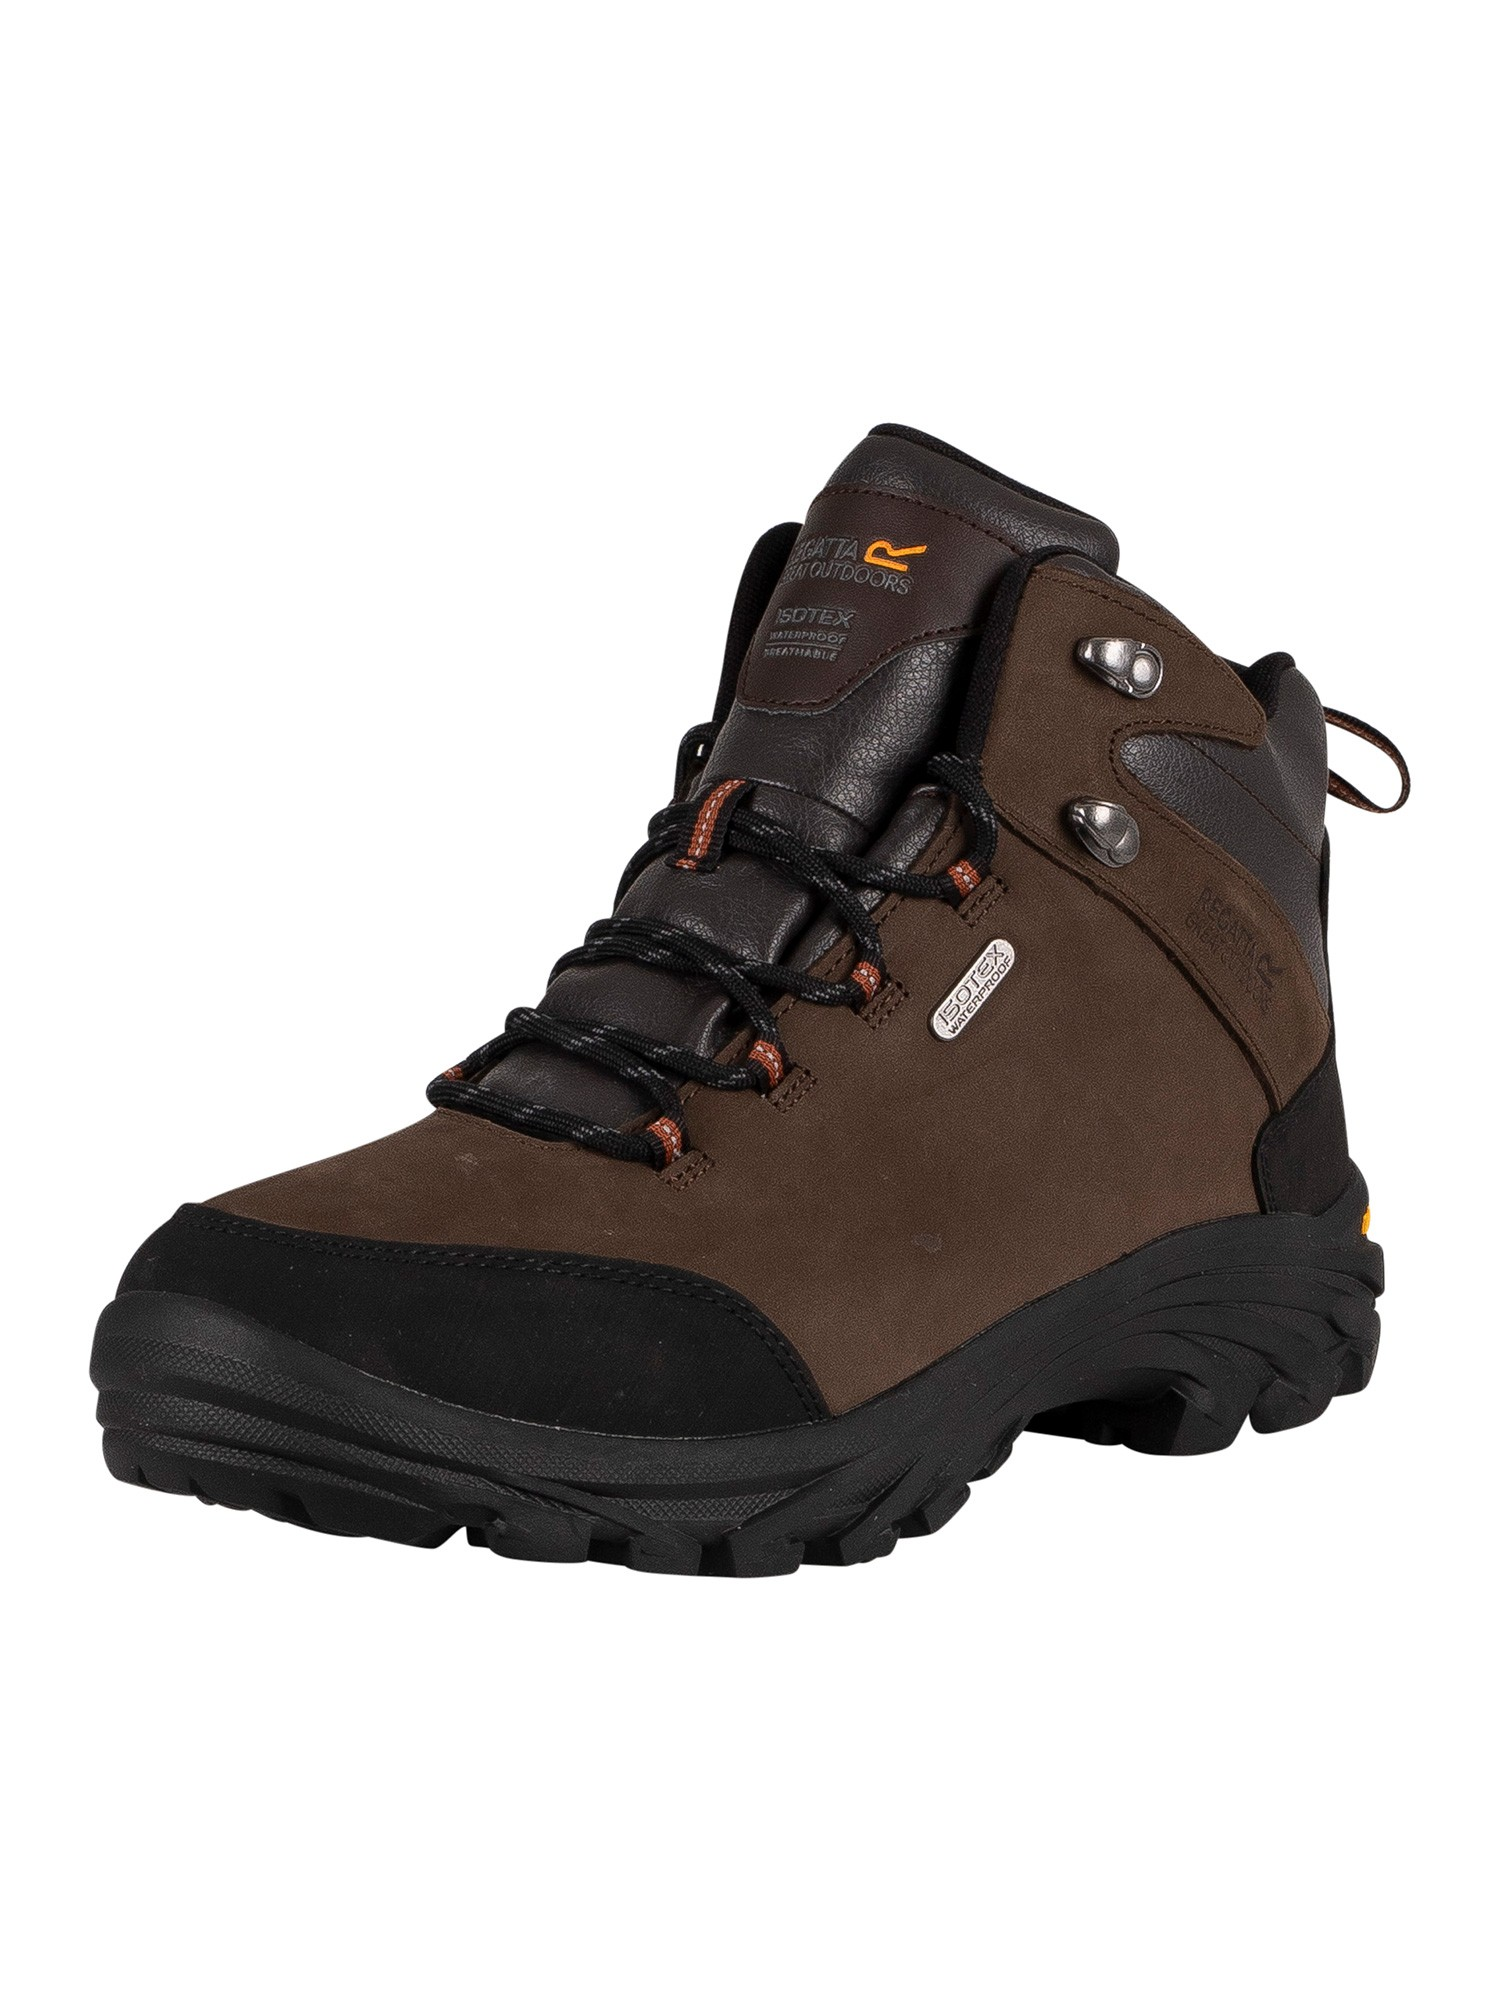 Burrell Leather Vibram Walking Boots